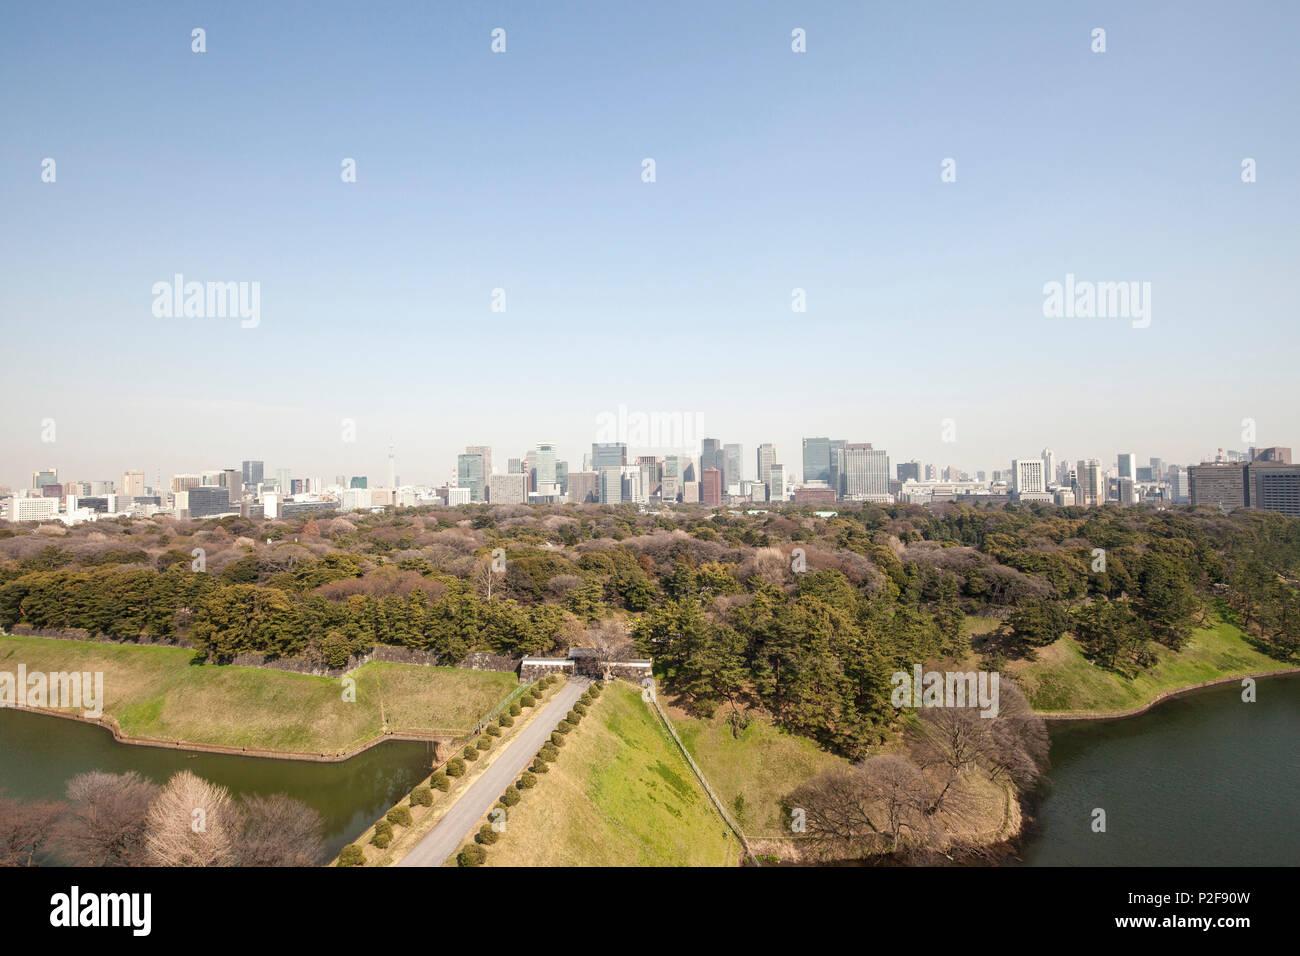 Imperial Palace Ground with banking quarter Marunouchi in background, Chiyoda-ku, Tokyo, Japan - Stock Image